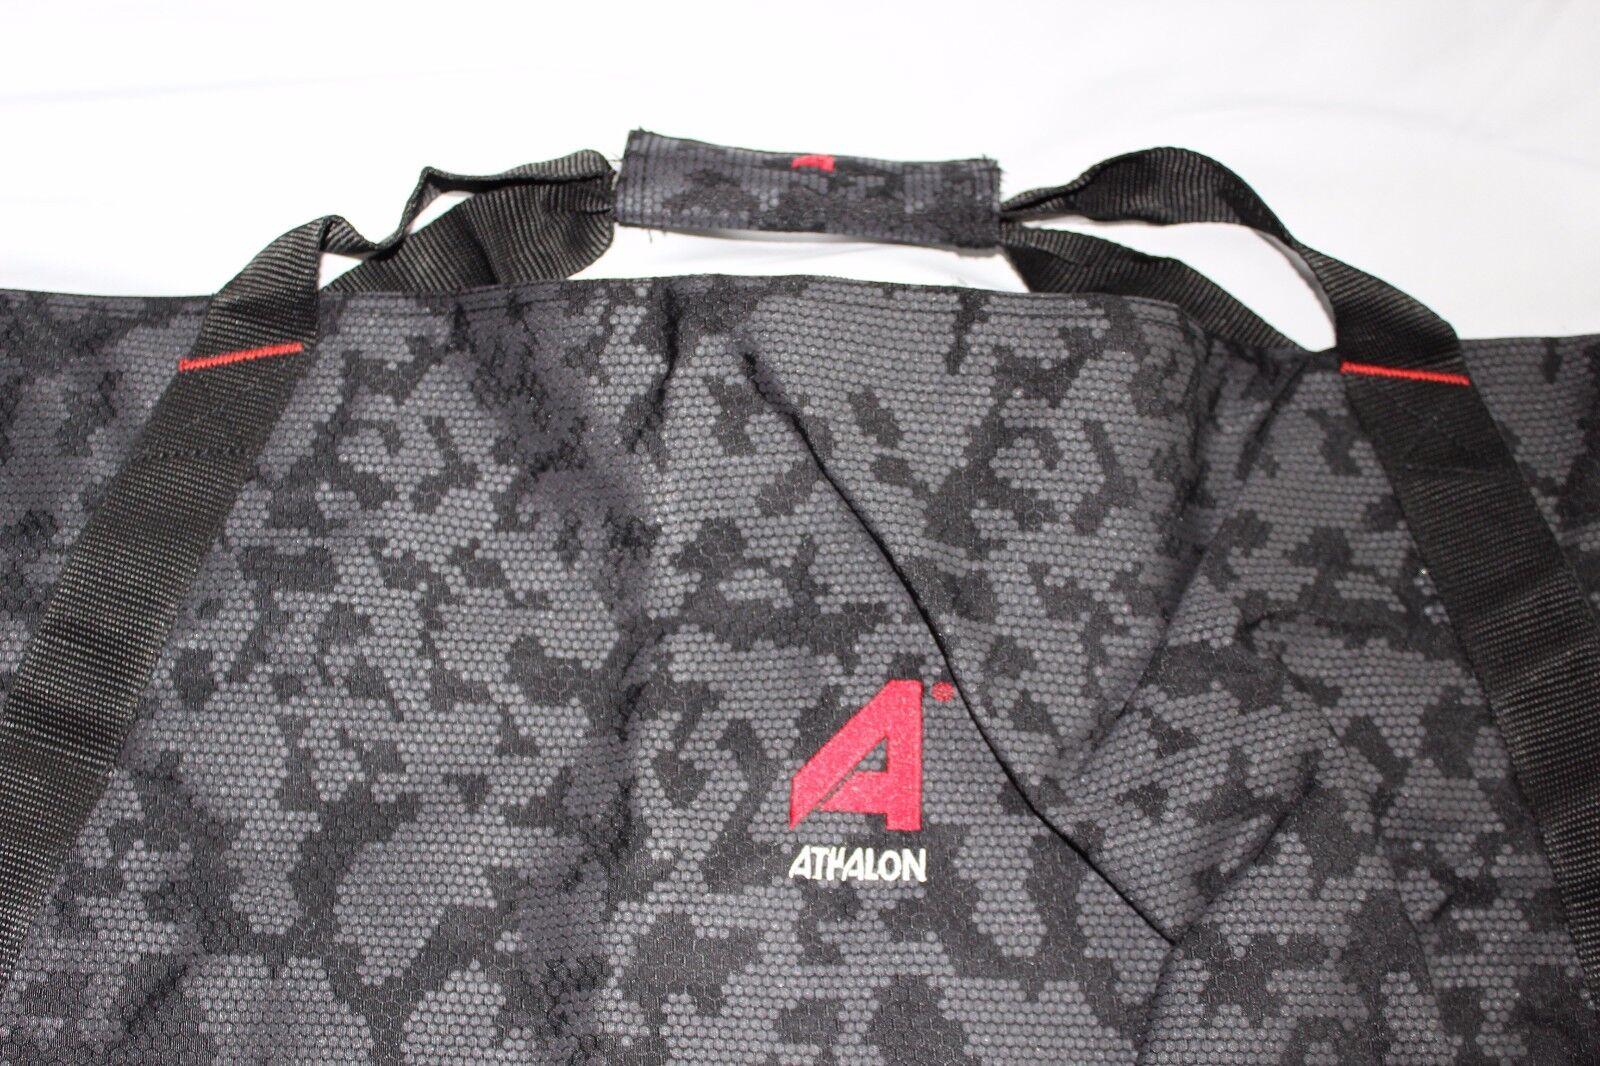 ATHALON 2 PIECE SET Stiefel BAG & SINGLE BAG SKI BAG SINGLE (Night Vision) Free Shipping a6c6c8